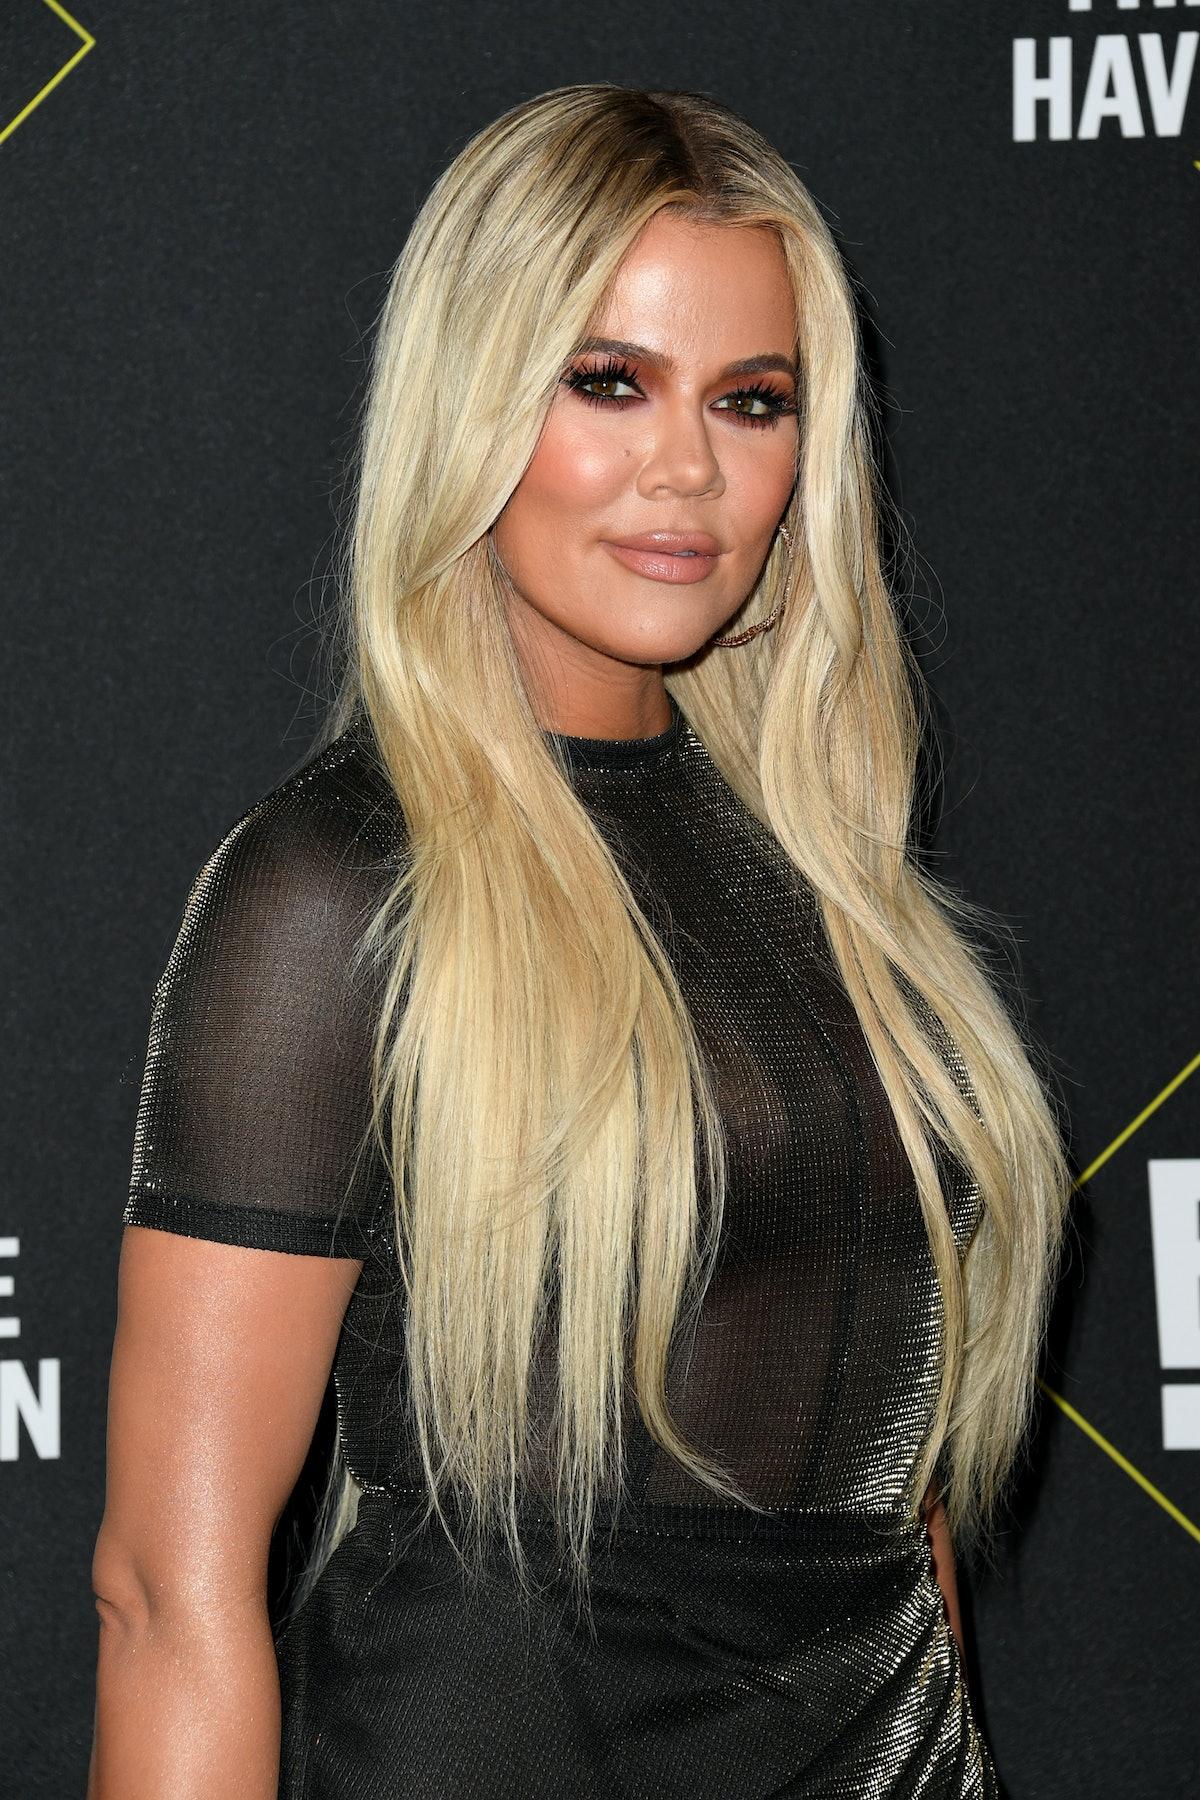 SANTA MONICA, CALIFORNIA - NOVEMBER 10: Khloé Kardashian attends the 2019 E! People's Choice Awards ...